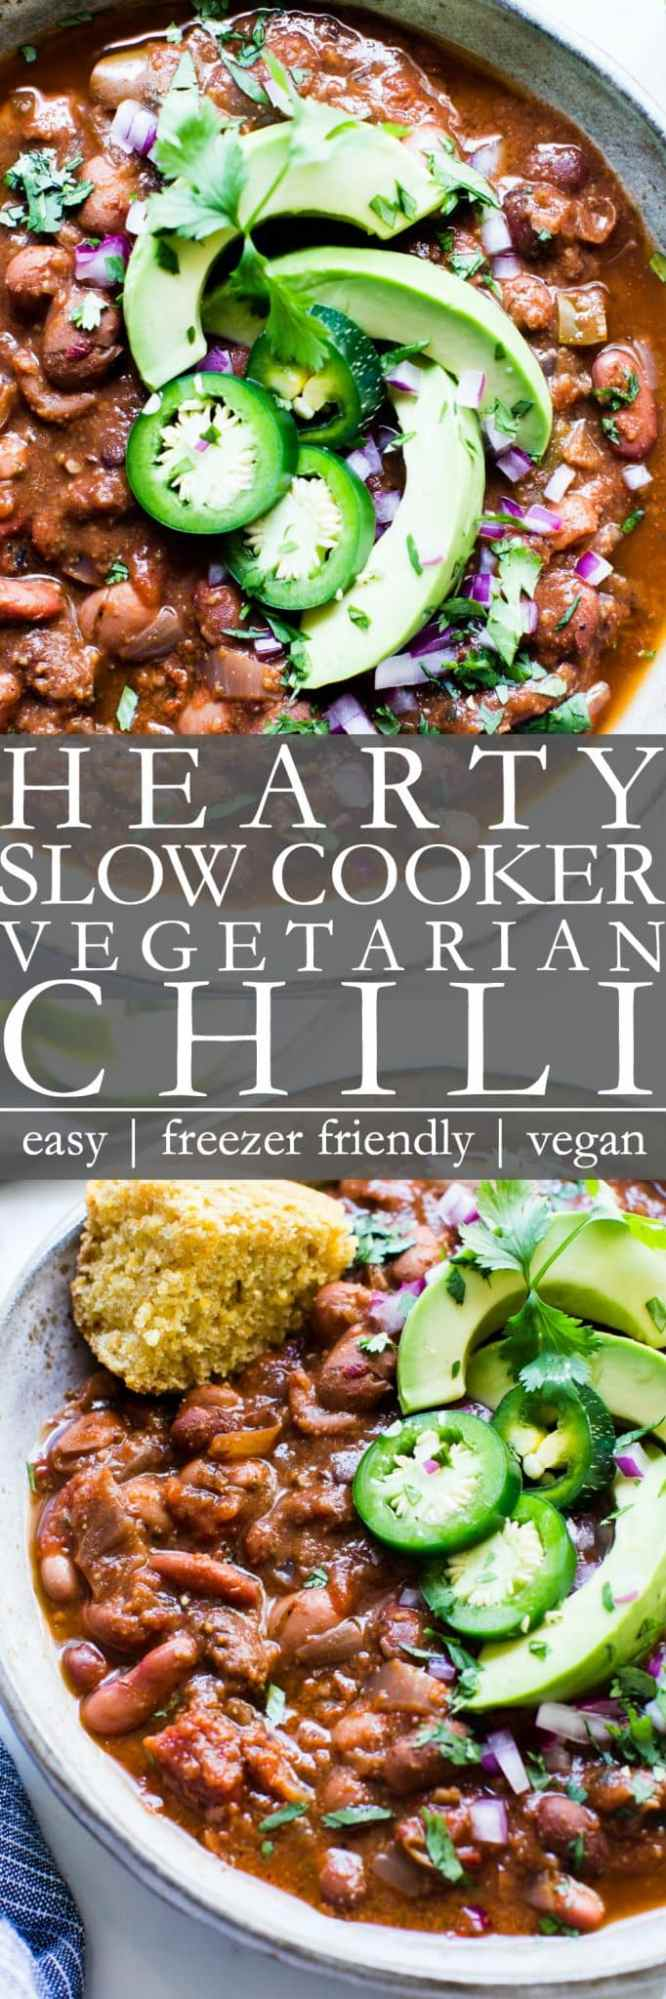 Vegan Chili Slow Cooker